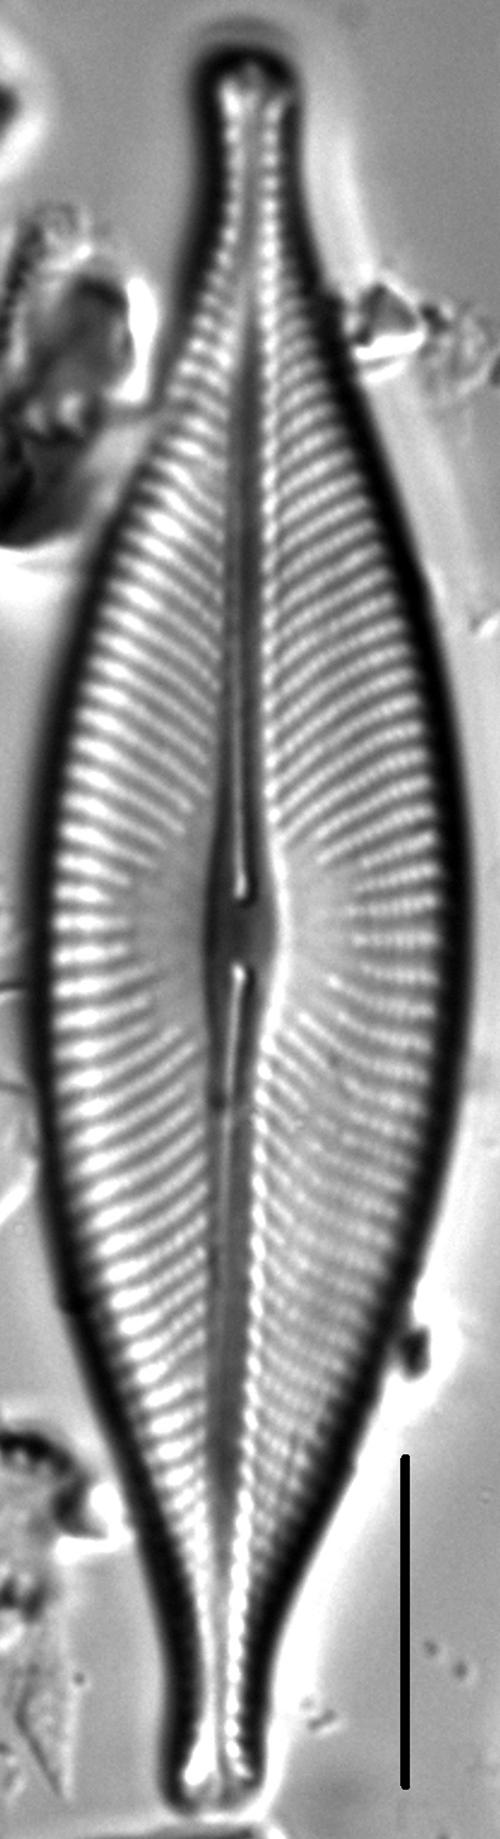 Navicula whitefishensis LM3